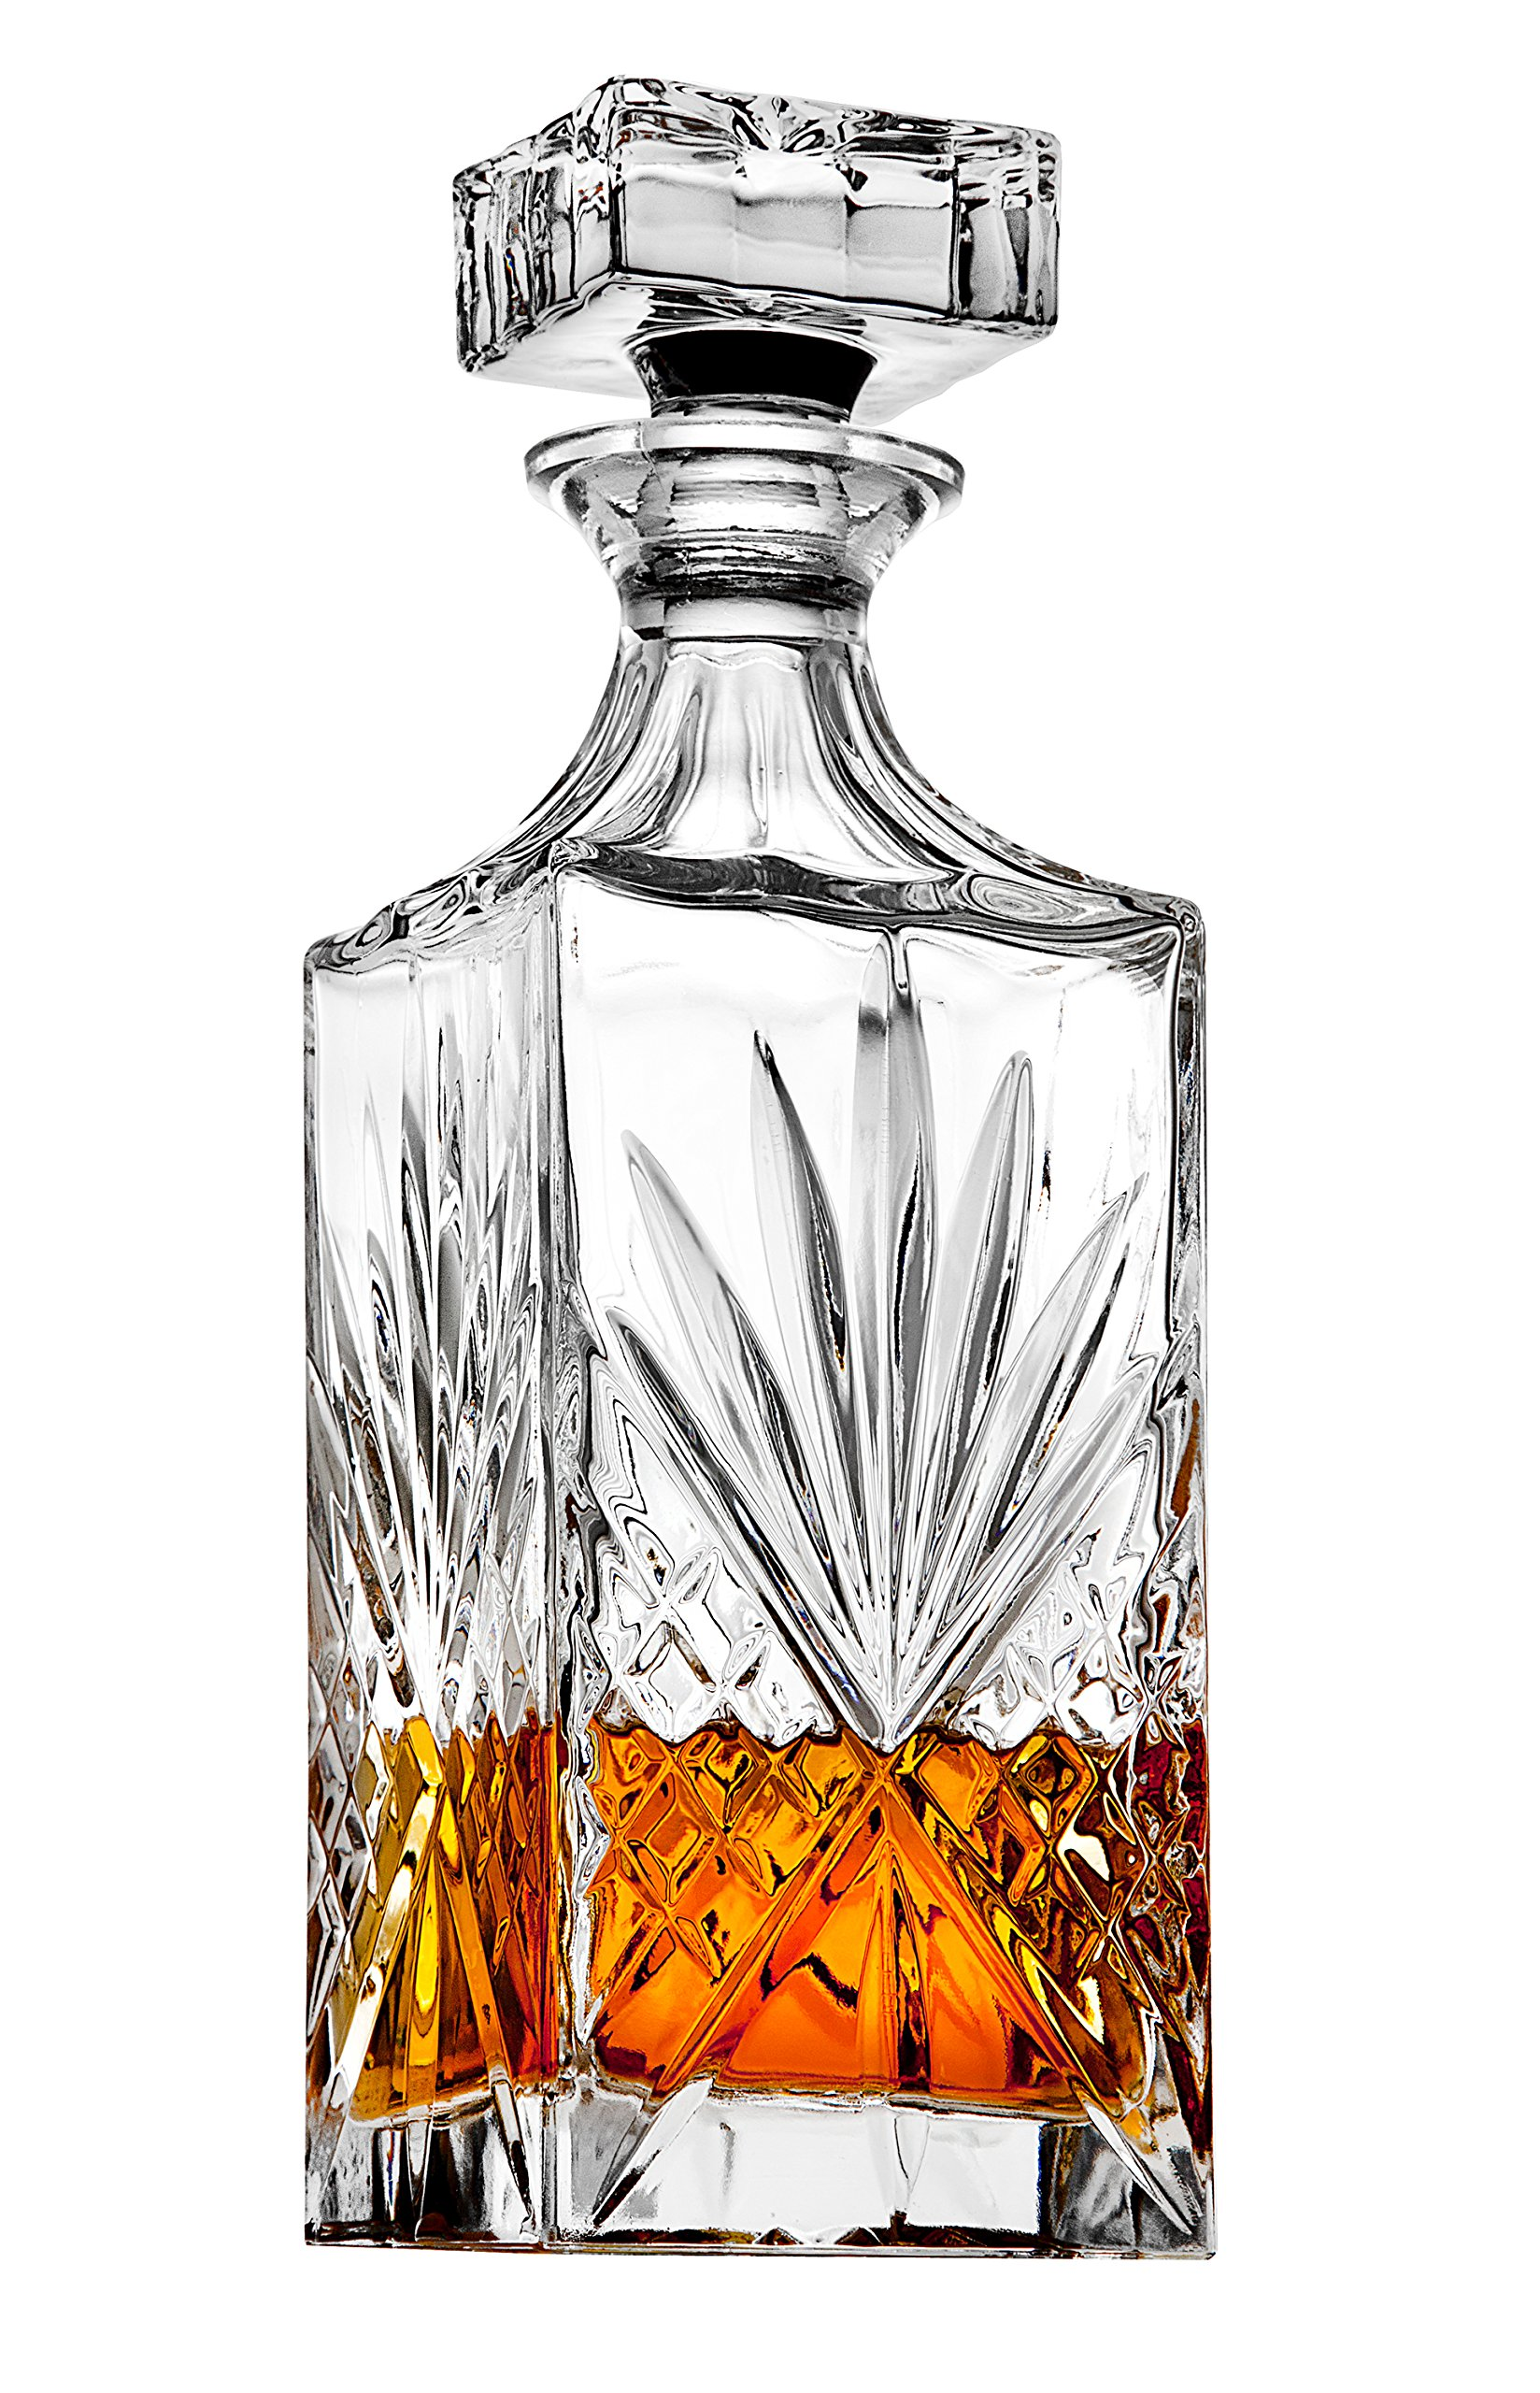 Crystal Whiskey Decanter For Liquor, Bourbon, Wine or Brandy - Irish Cut 750ml